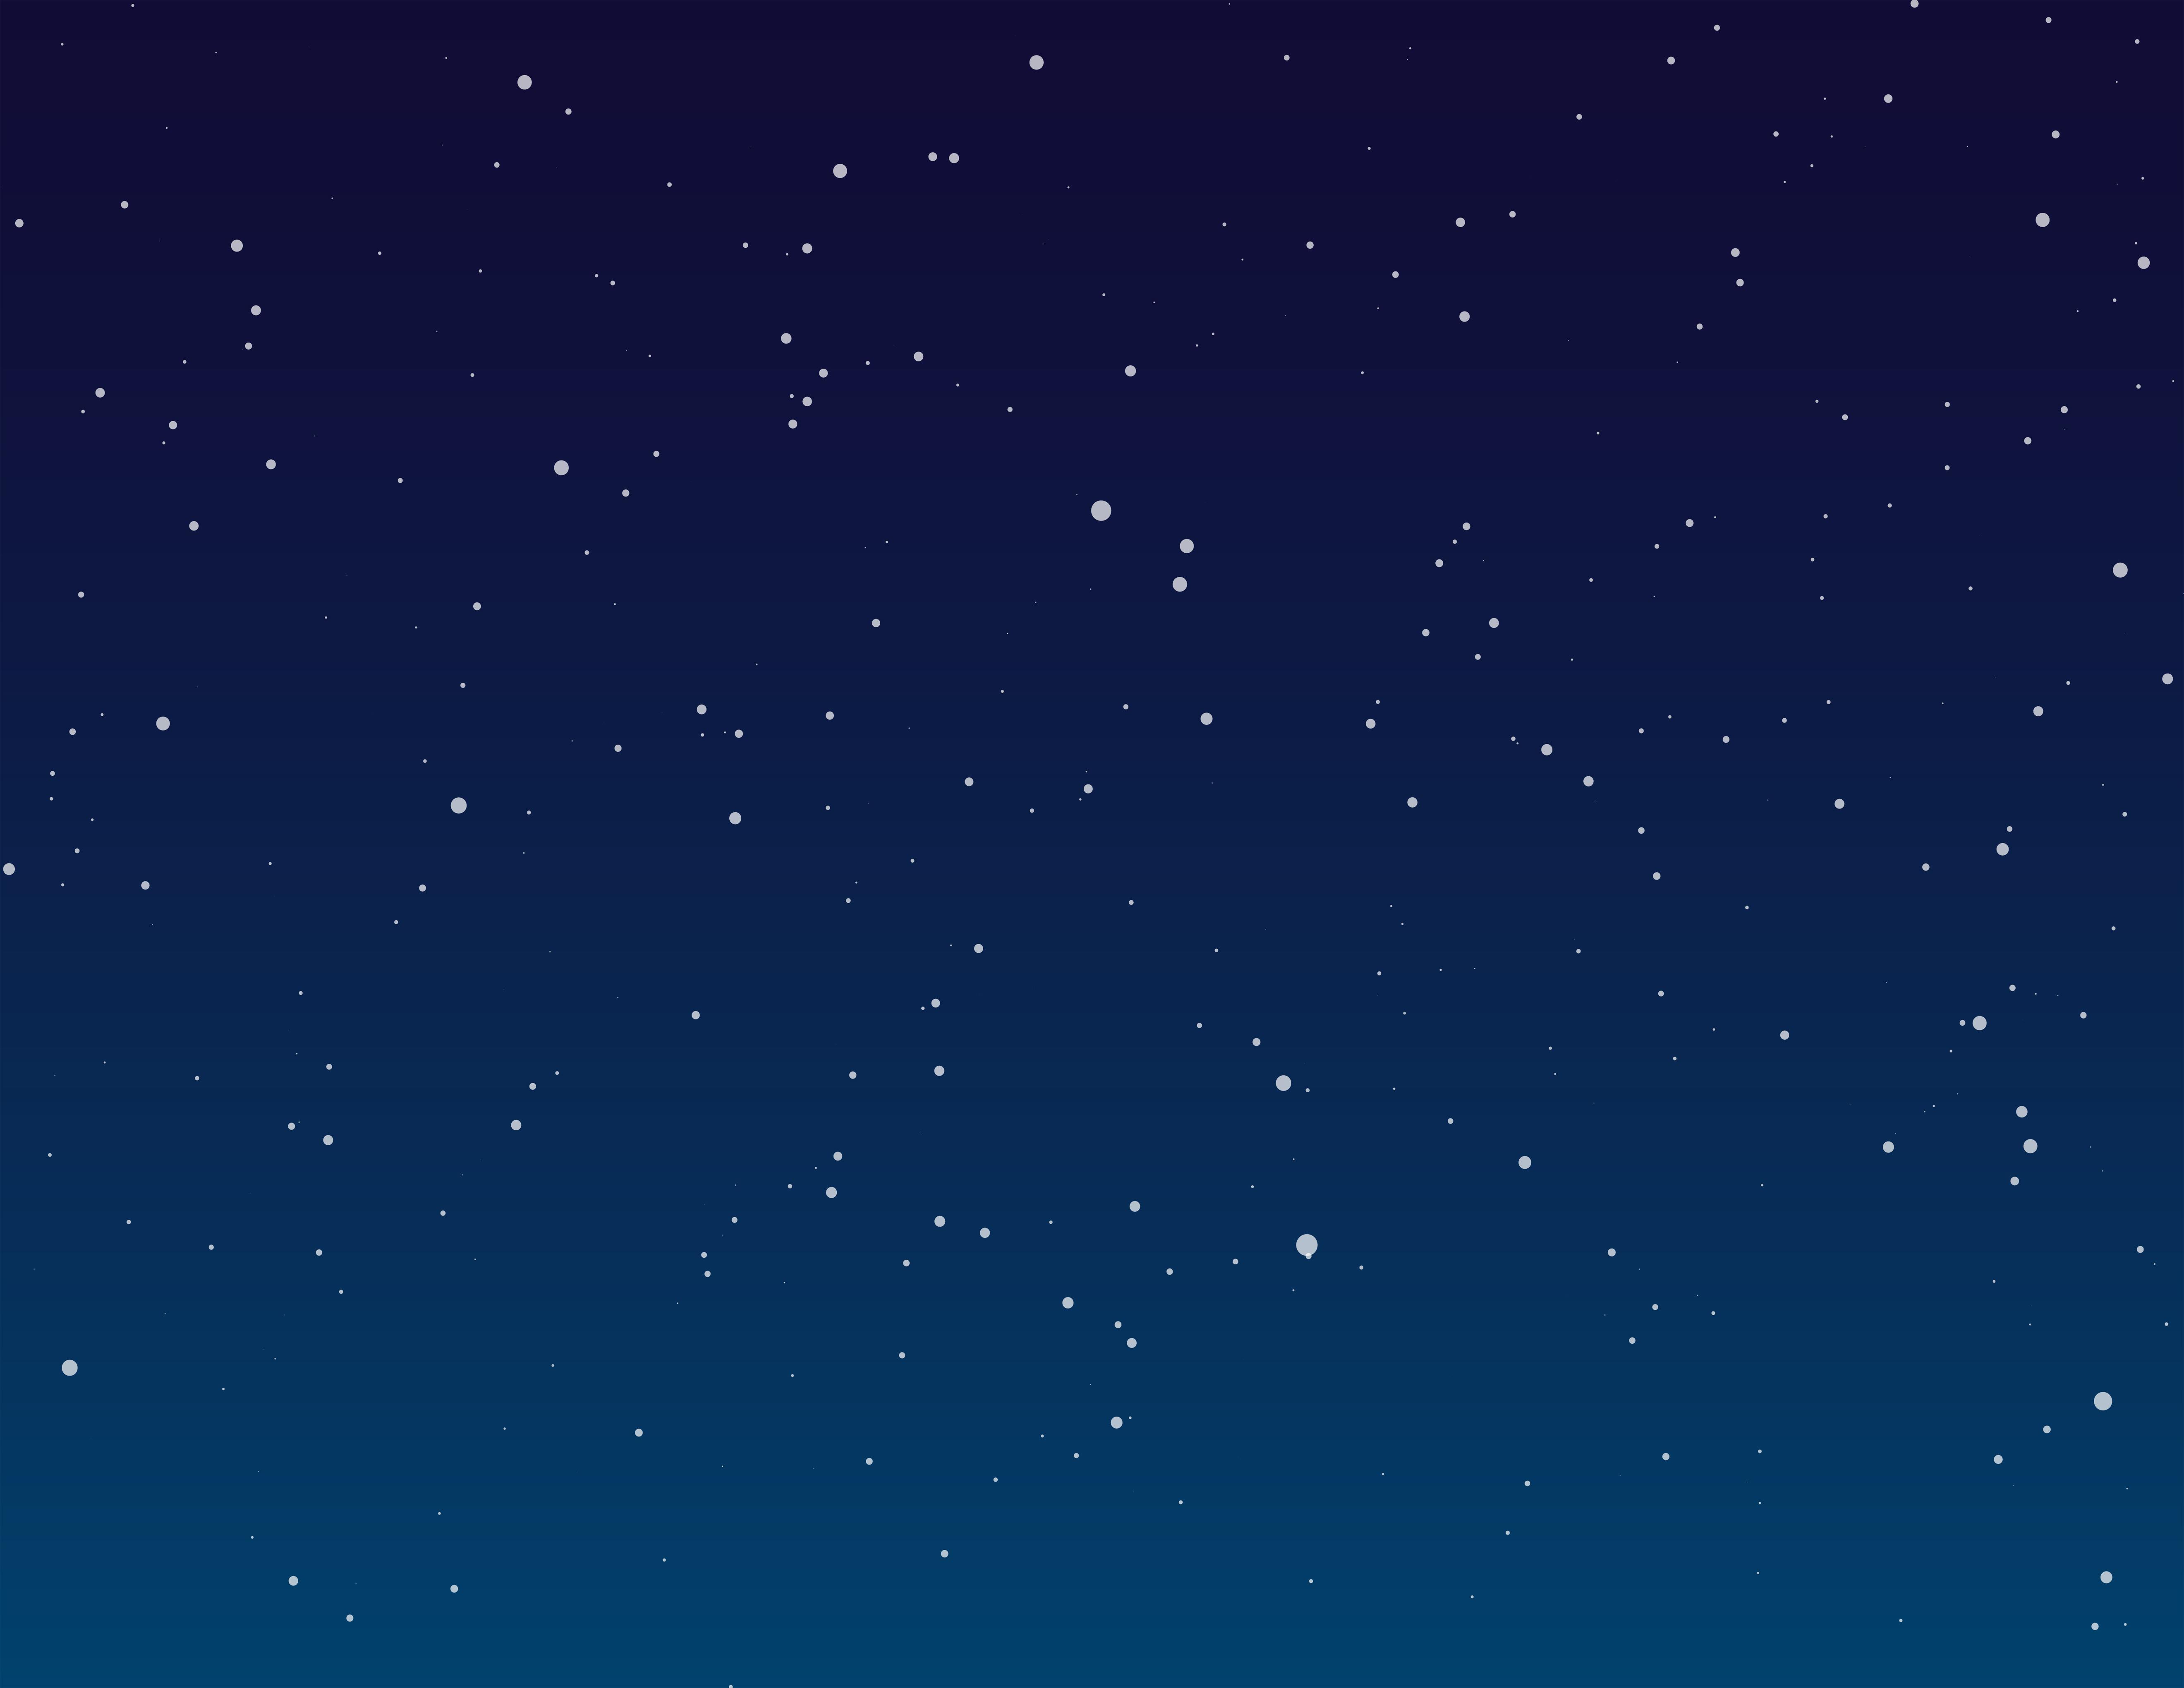 Night Sky Background 5280x4080